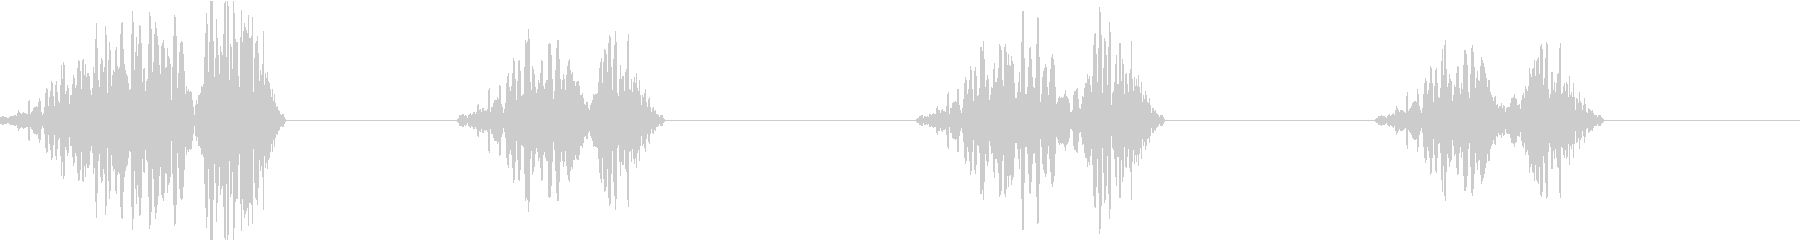 DJプレイ スクラッチ・ノイズ 184の未再生の波形